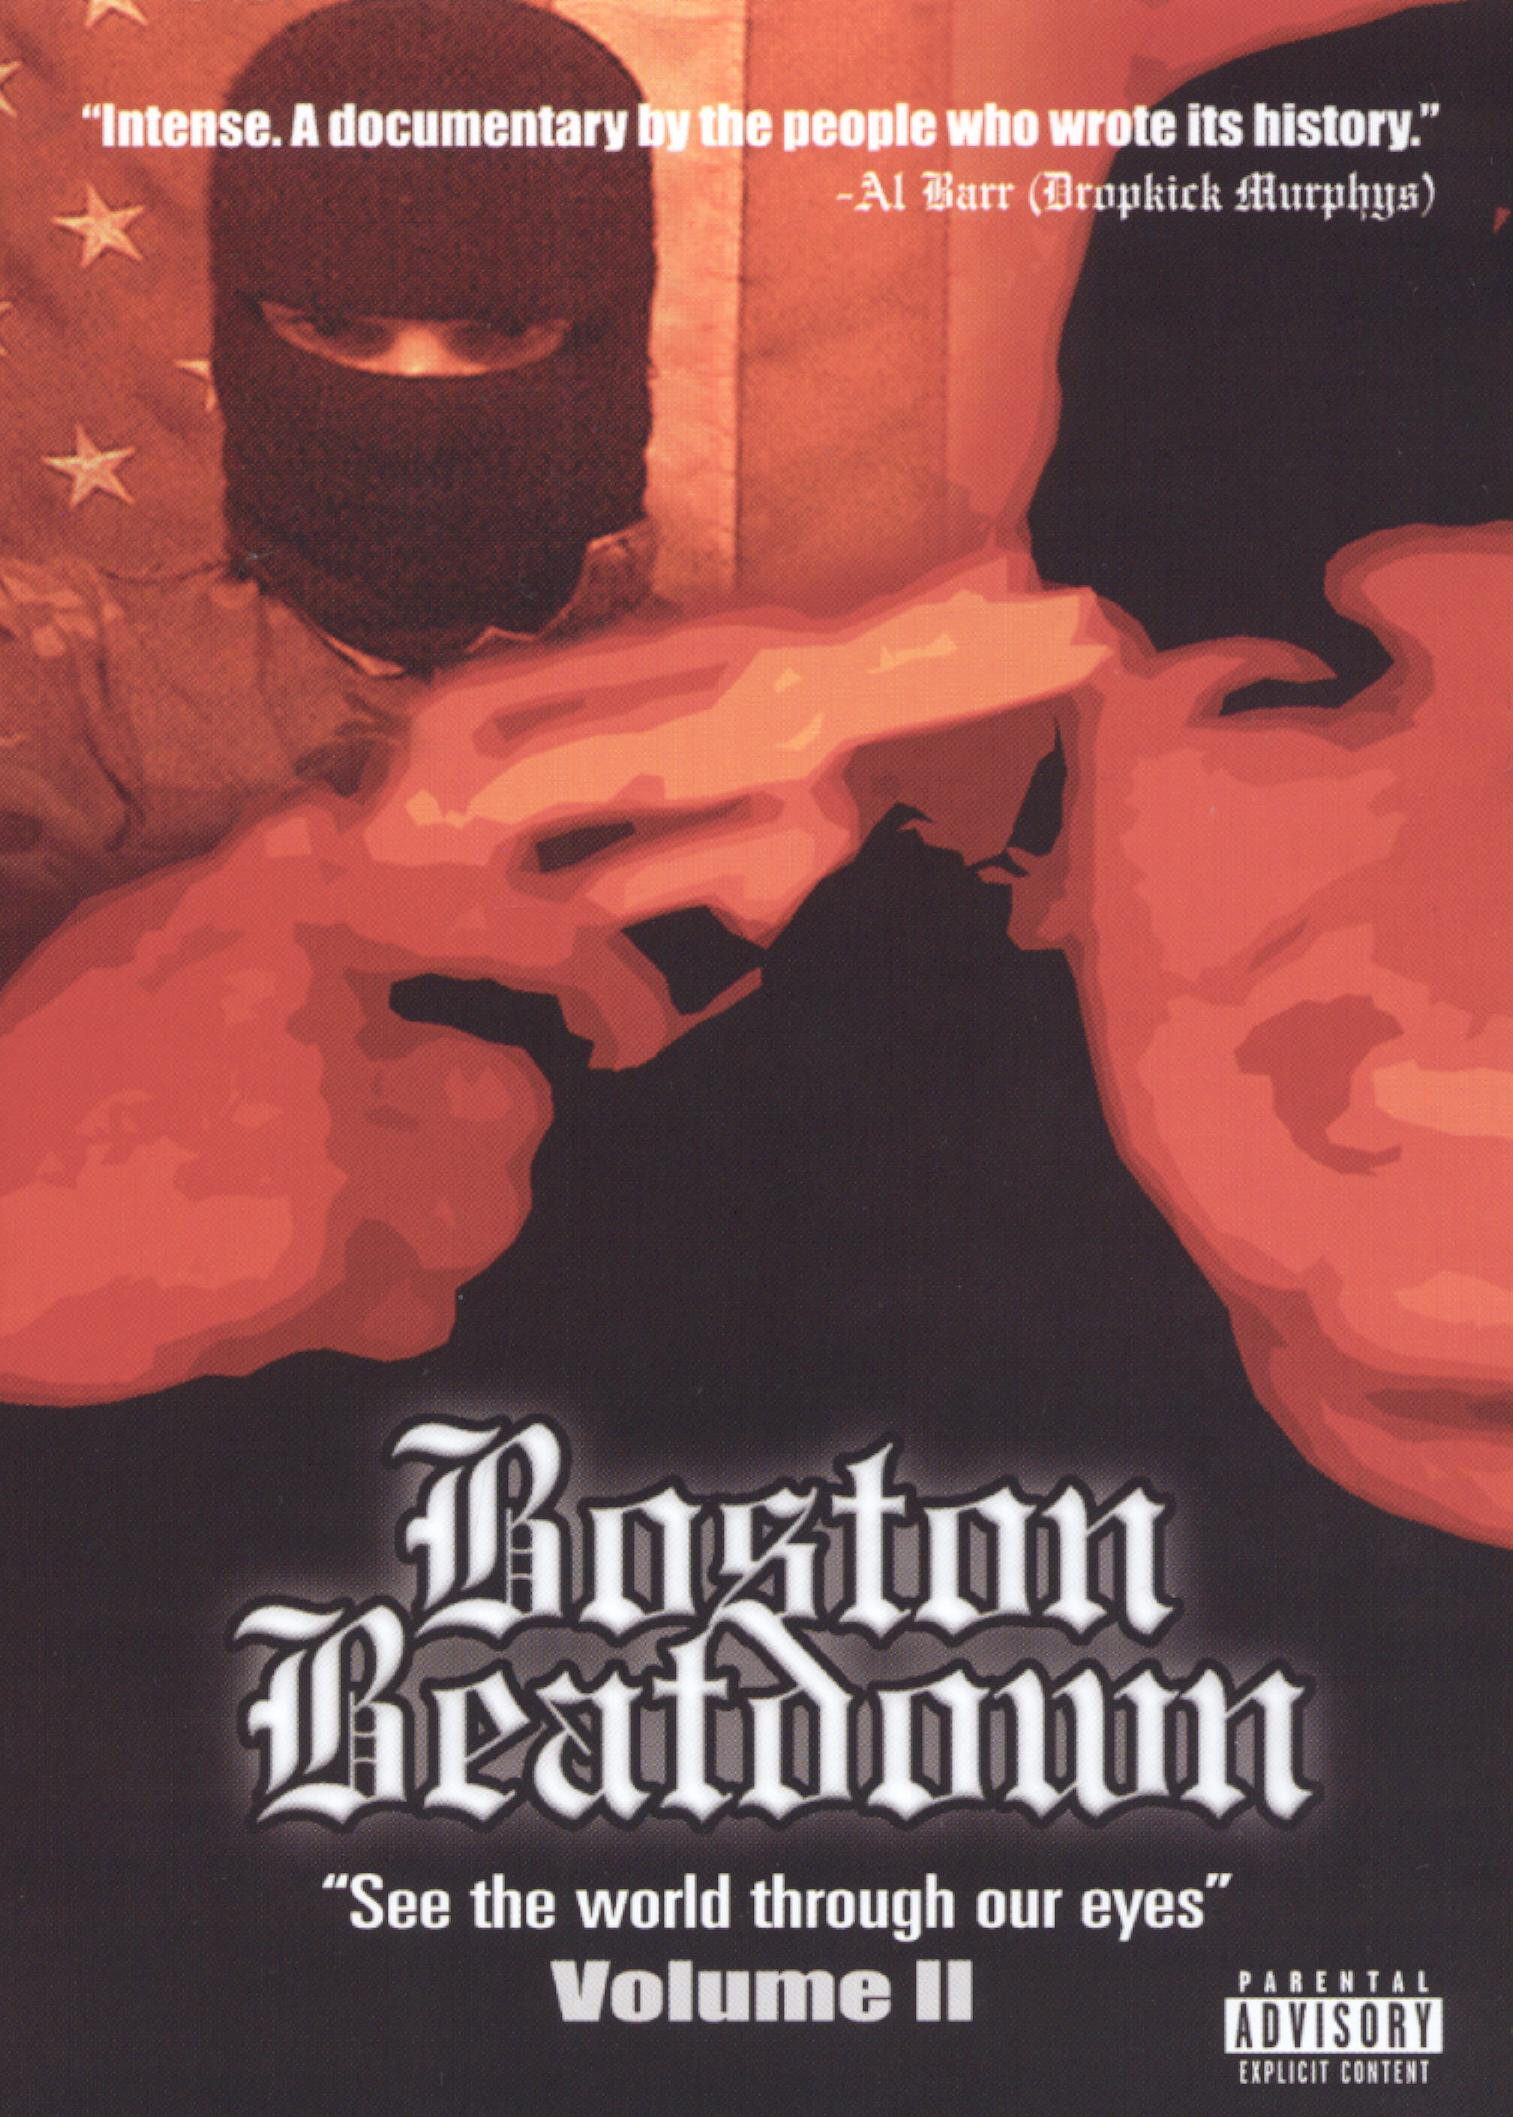 Boston Beatdown, Vol. II